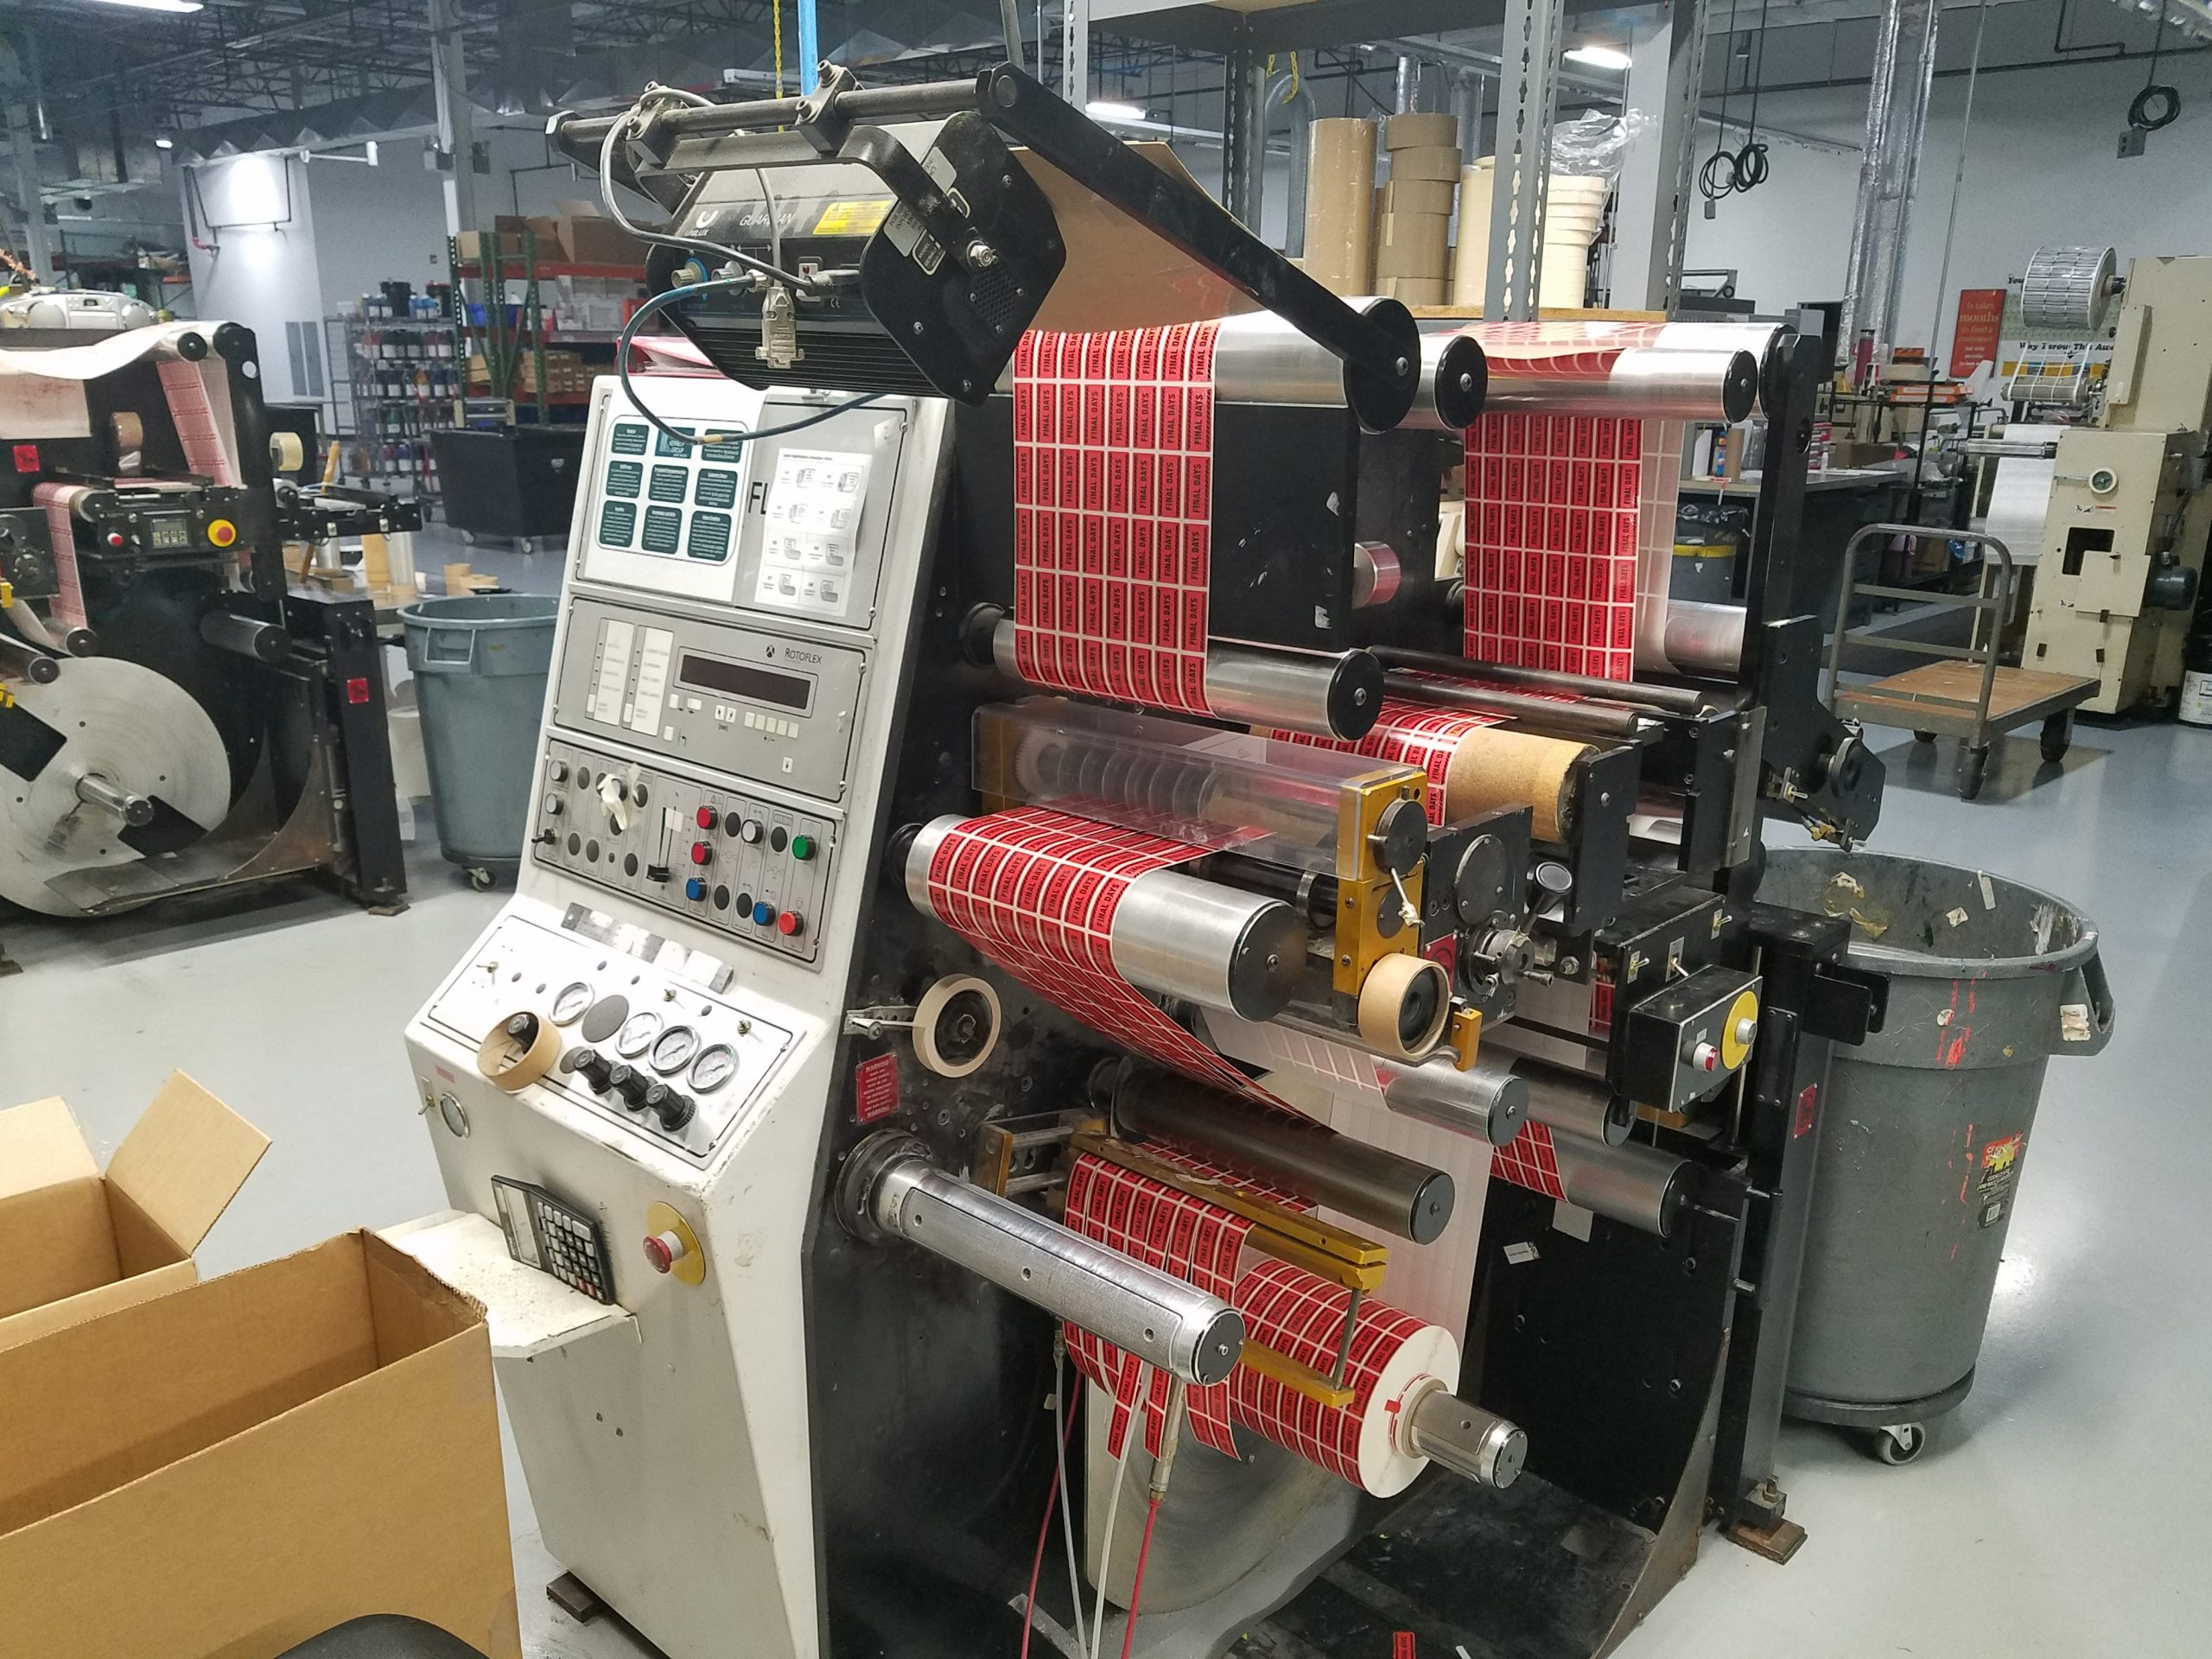 Rotoflex VSI330 - Used Flexo Printing Presses and Used Flexographic Equipment-0